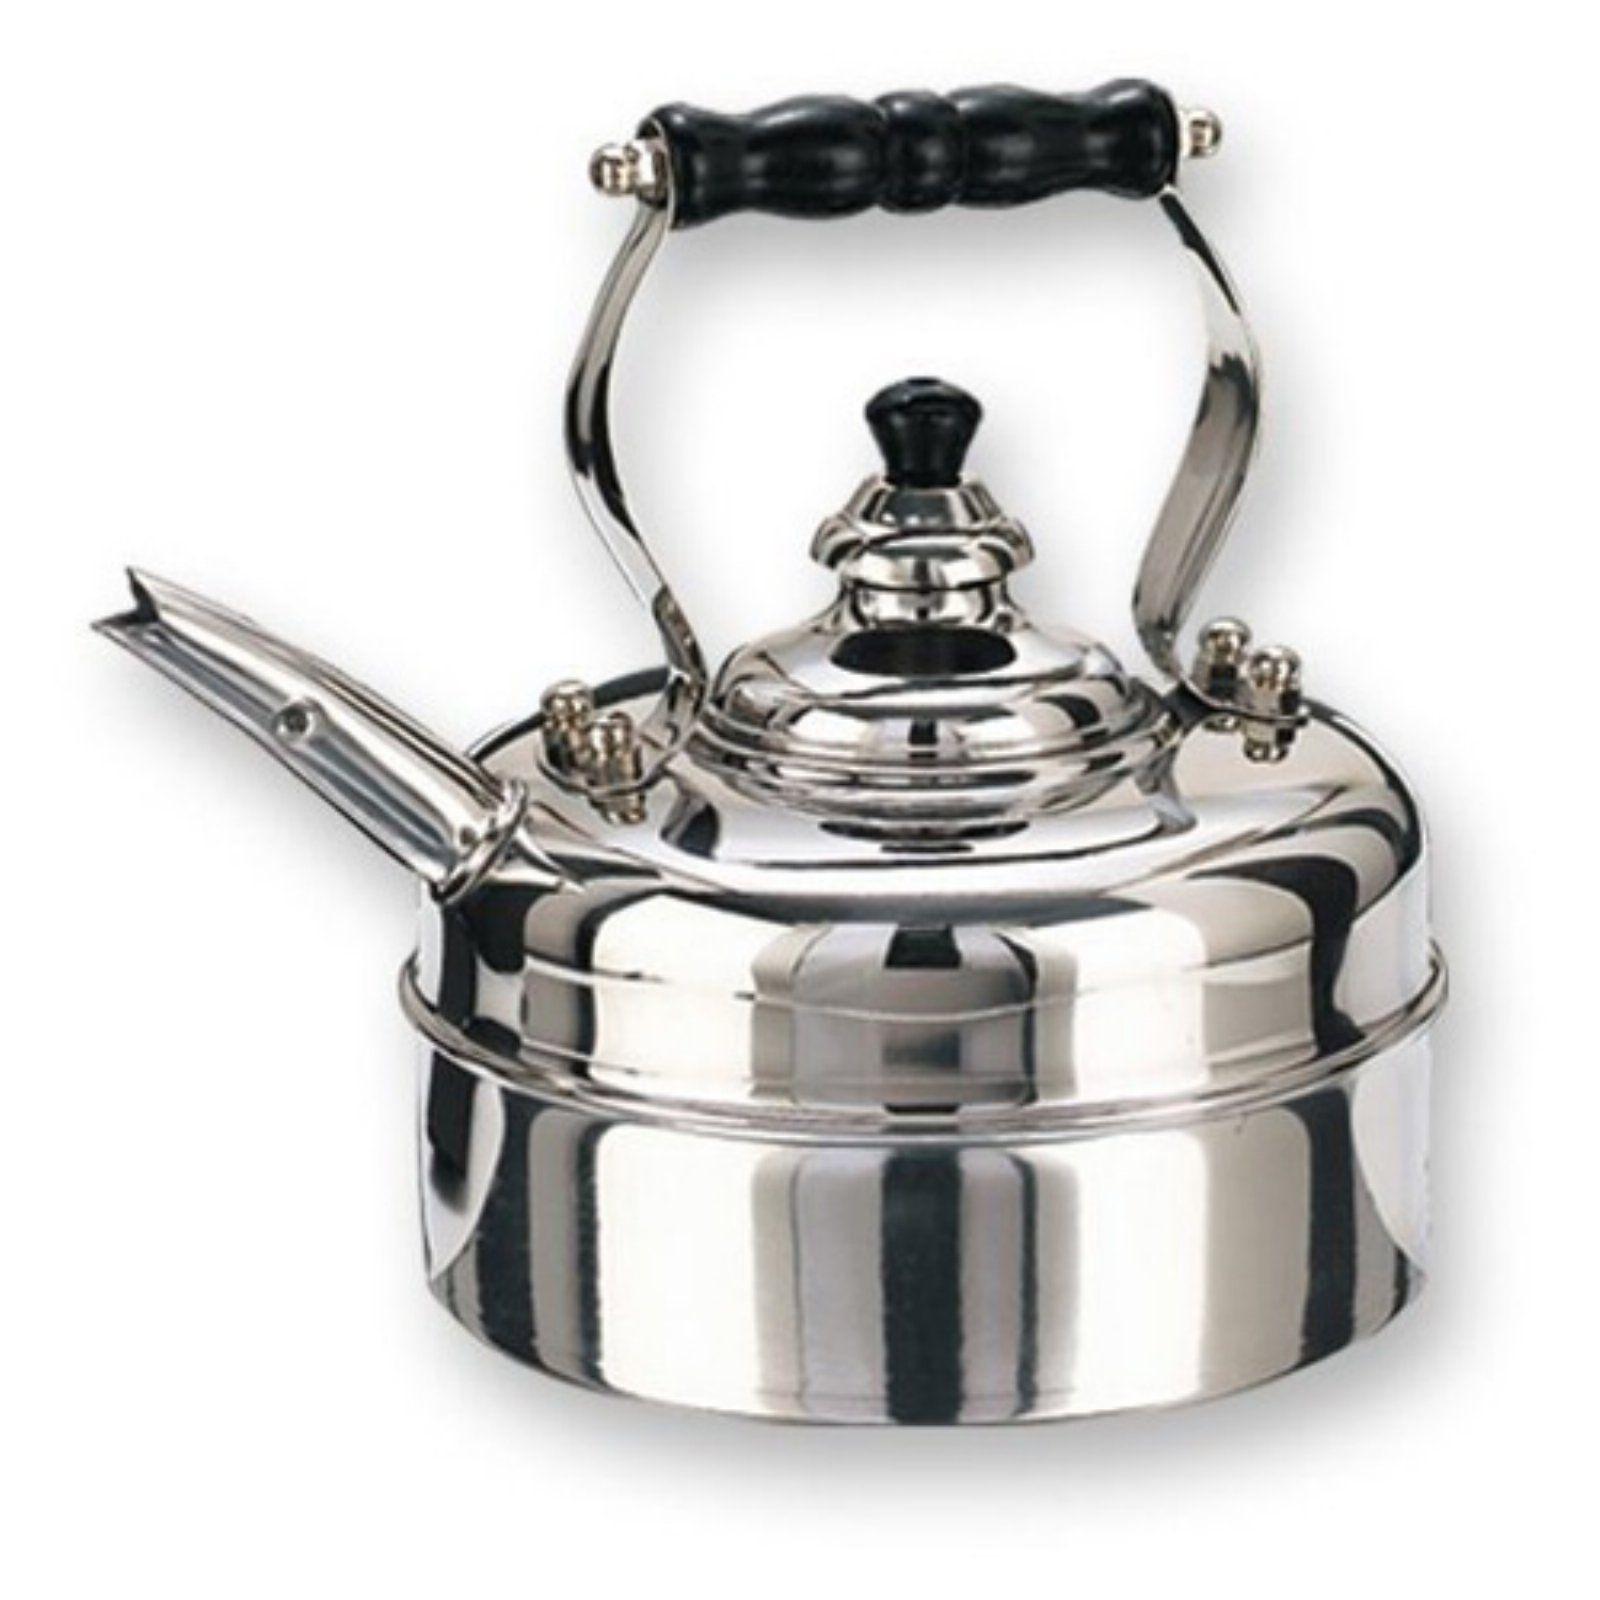 Whistling Tea Kettle, Stainless Steel